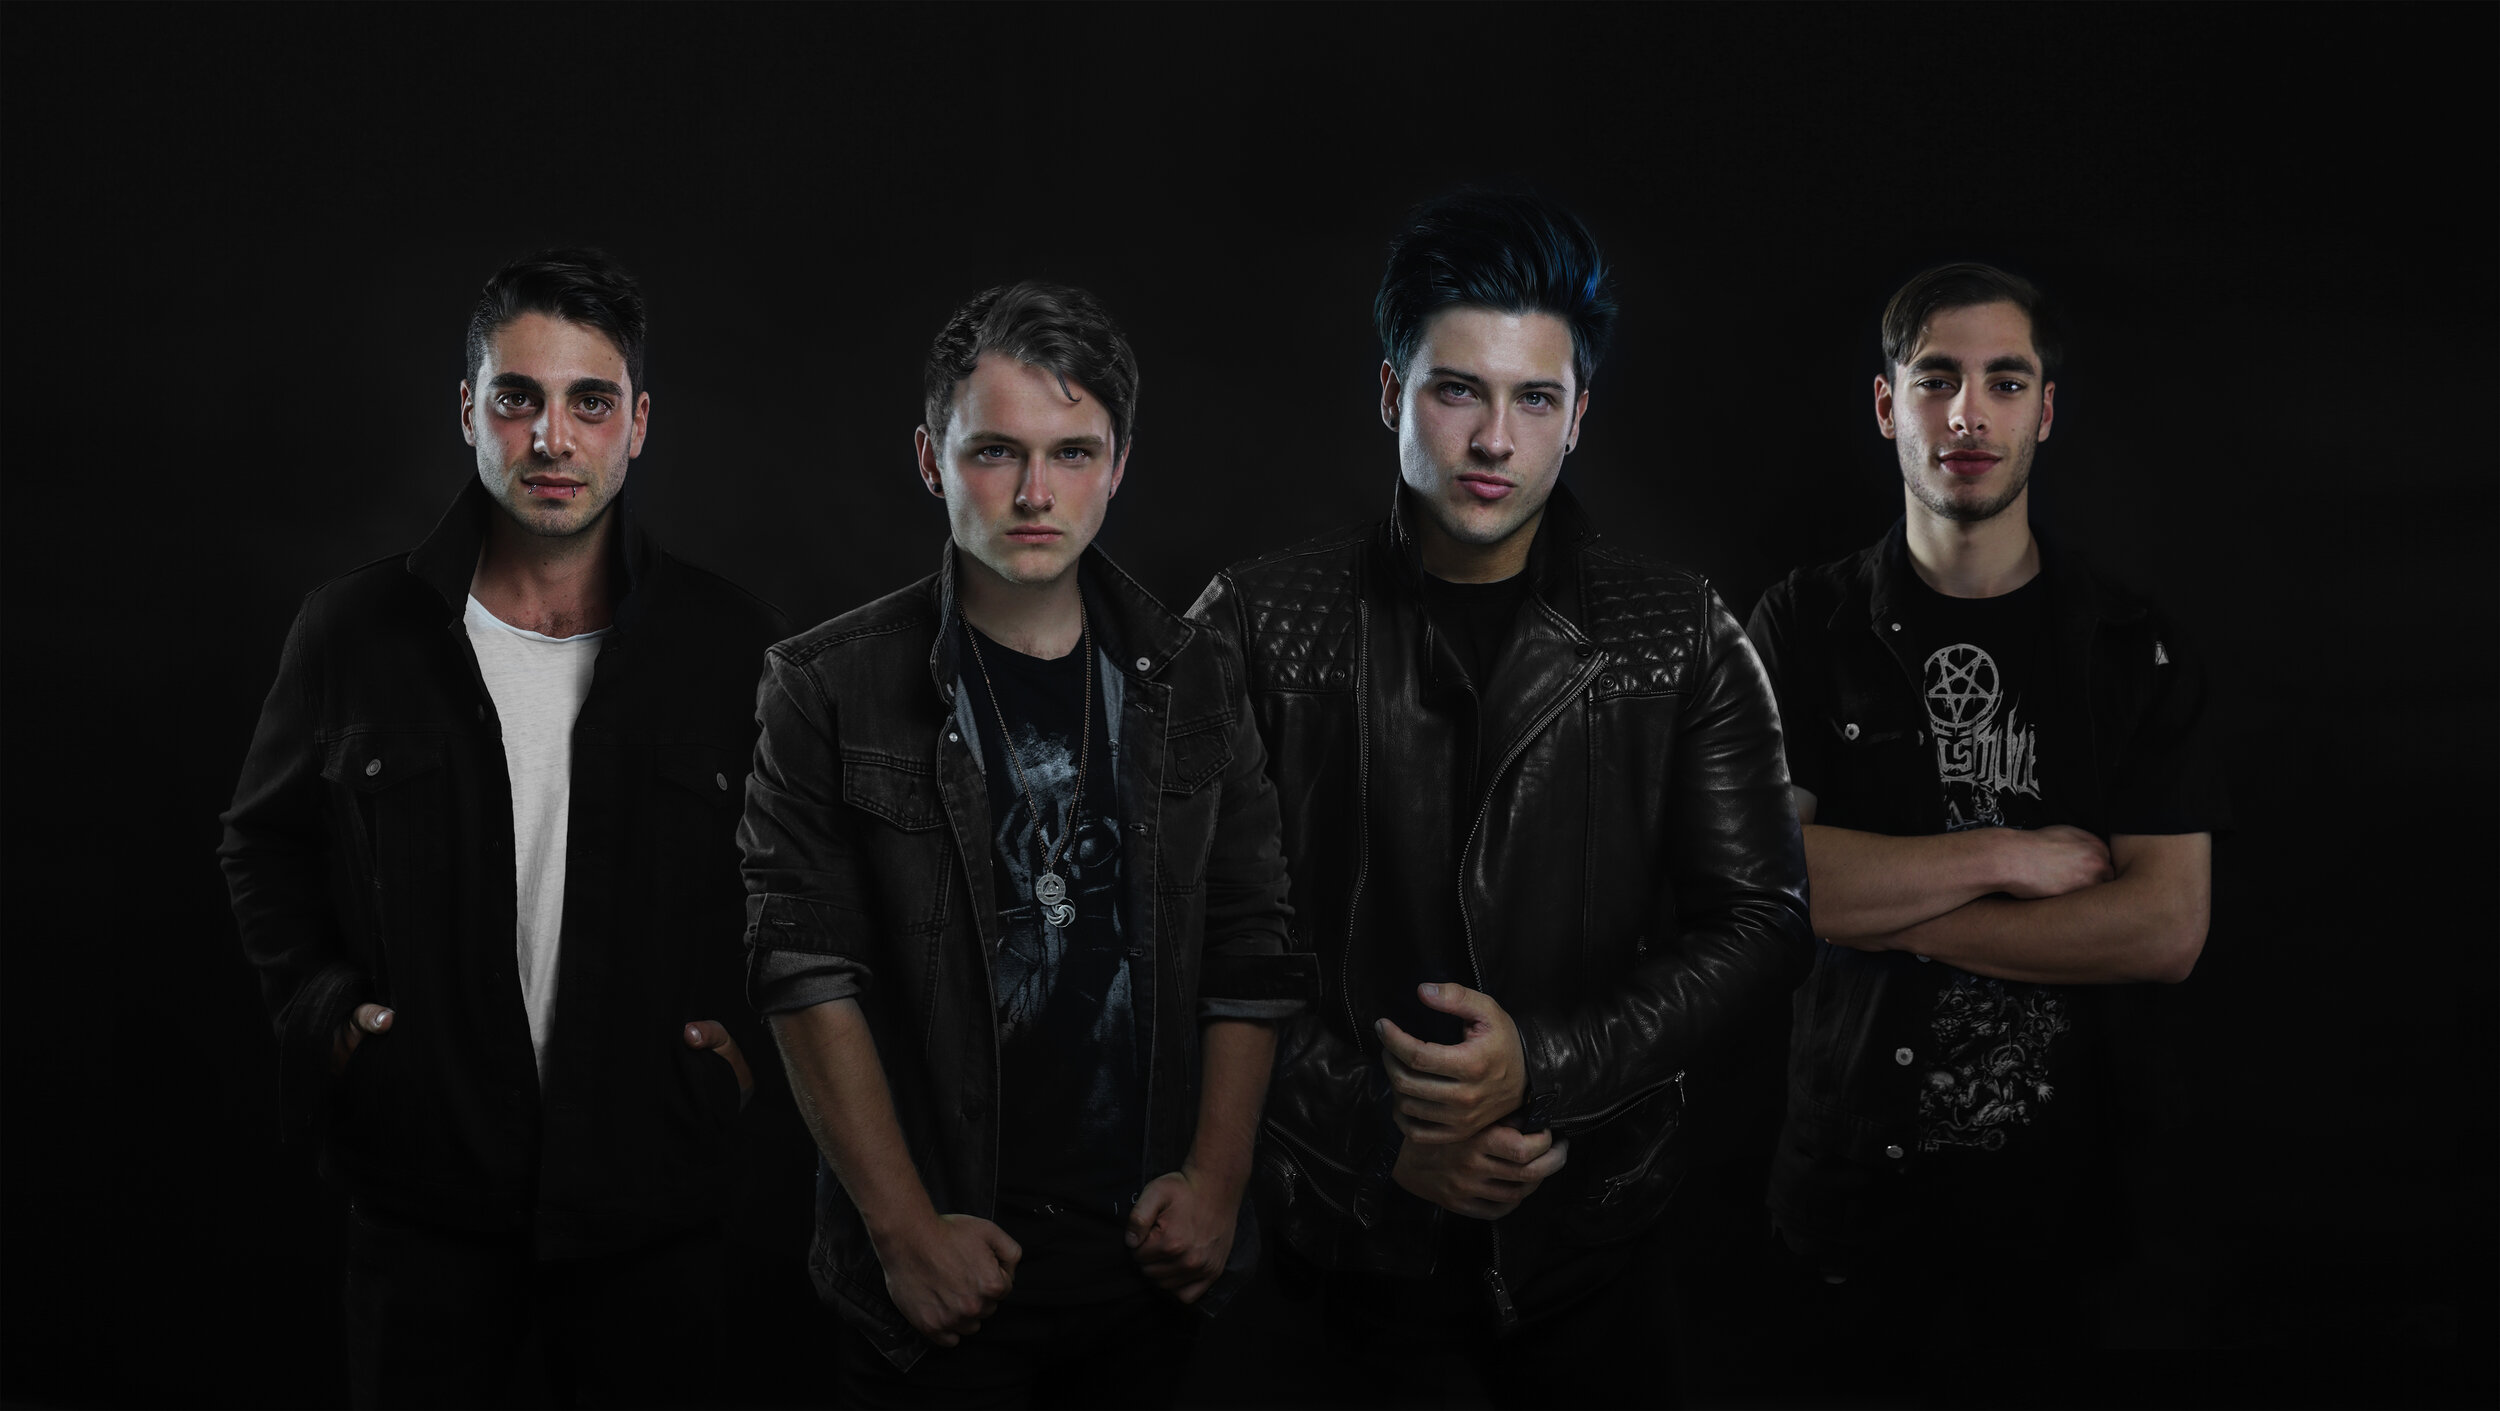 Left to right: Beau Grech (drums), Terence Stevens (vocals/rhythm guitar), Mitchell Black (lead guitar), Christian Centofanti (bass guitar).